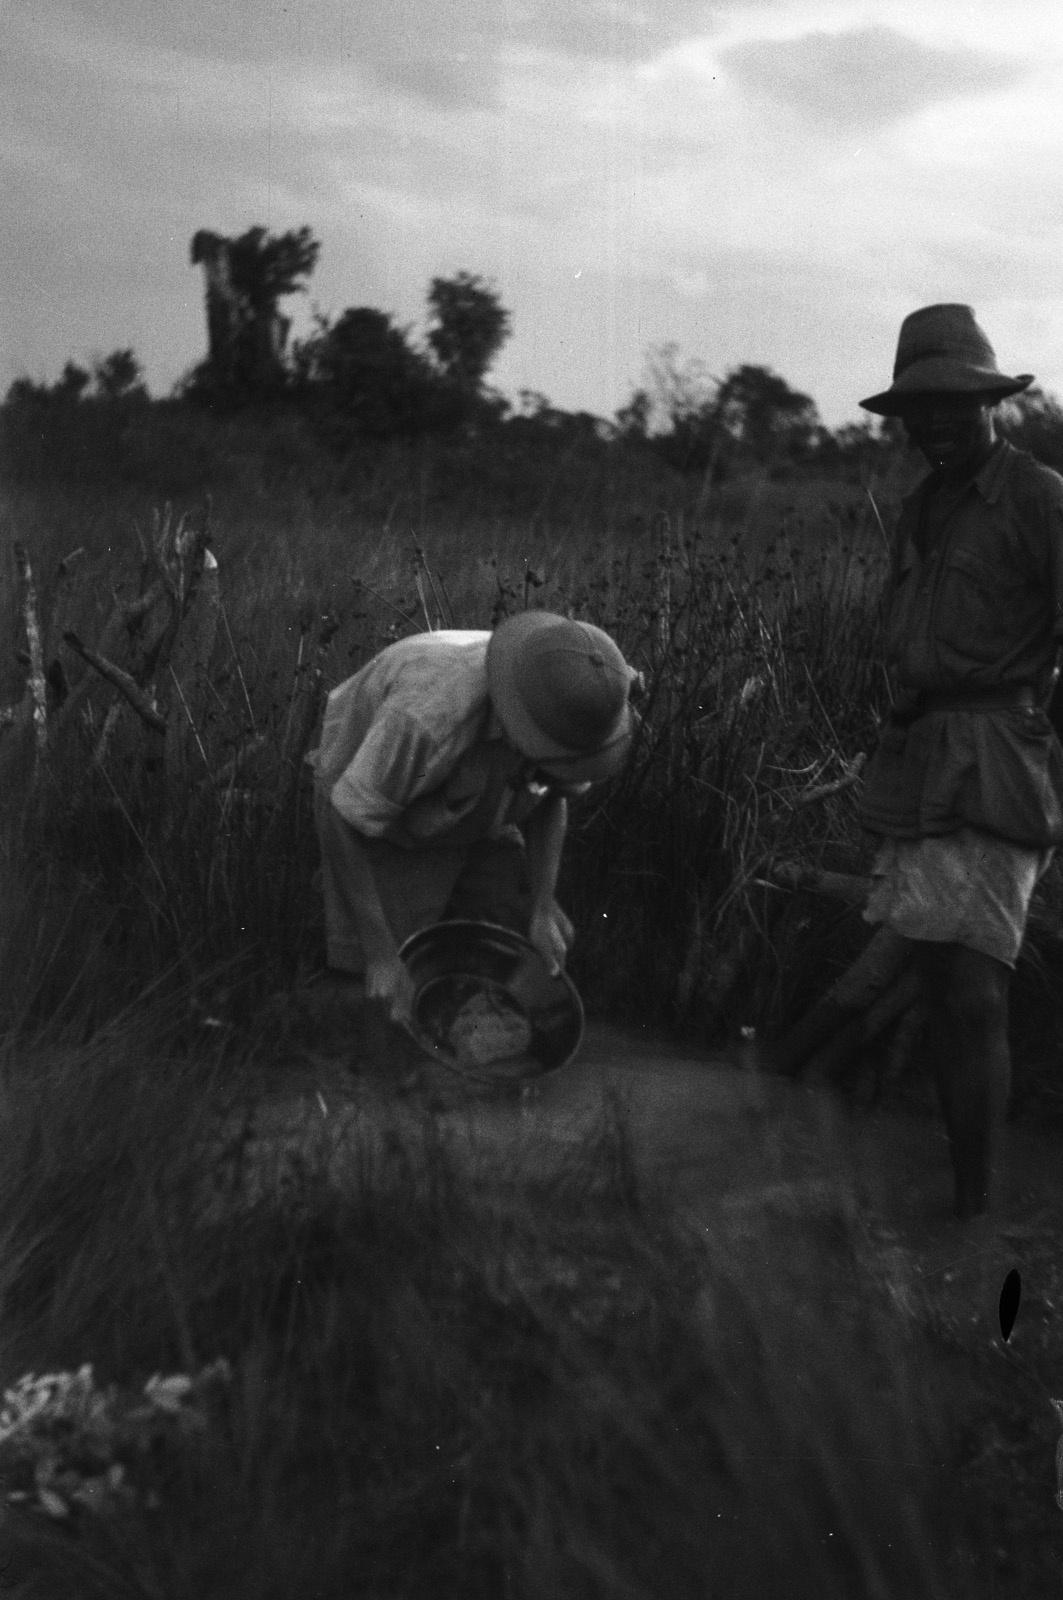 Капири Мпоши. Старатель ищет золото в Бахсанде